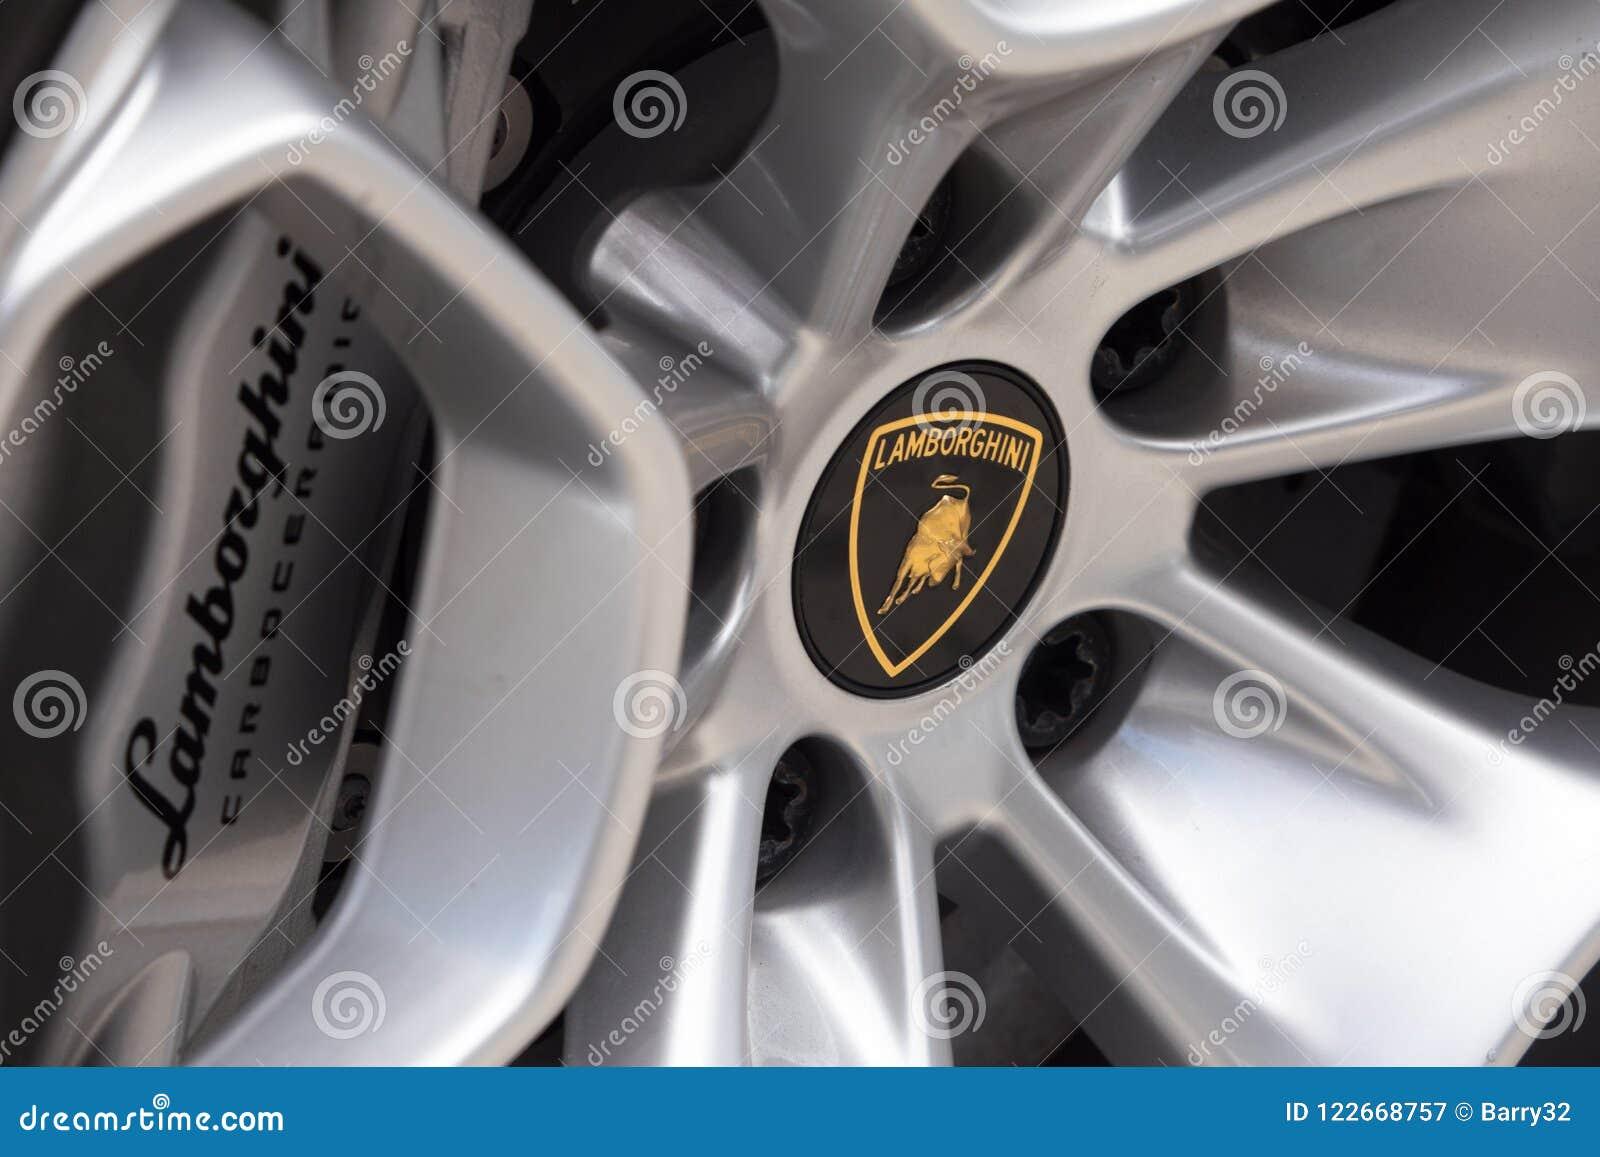 Close Up Of A Lamborghini Wheel With Bull Logo Editorial Photography